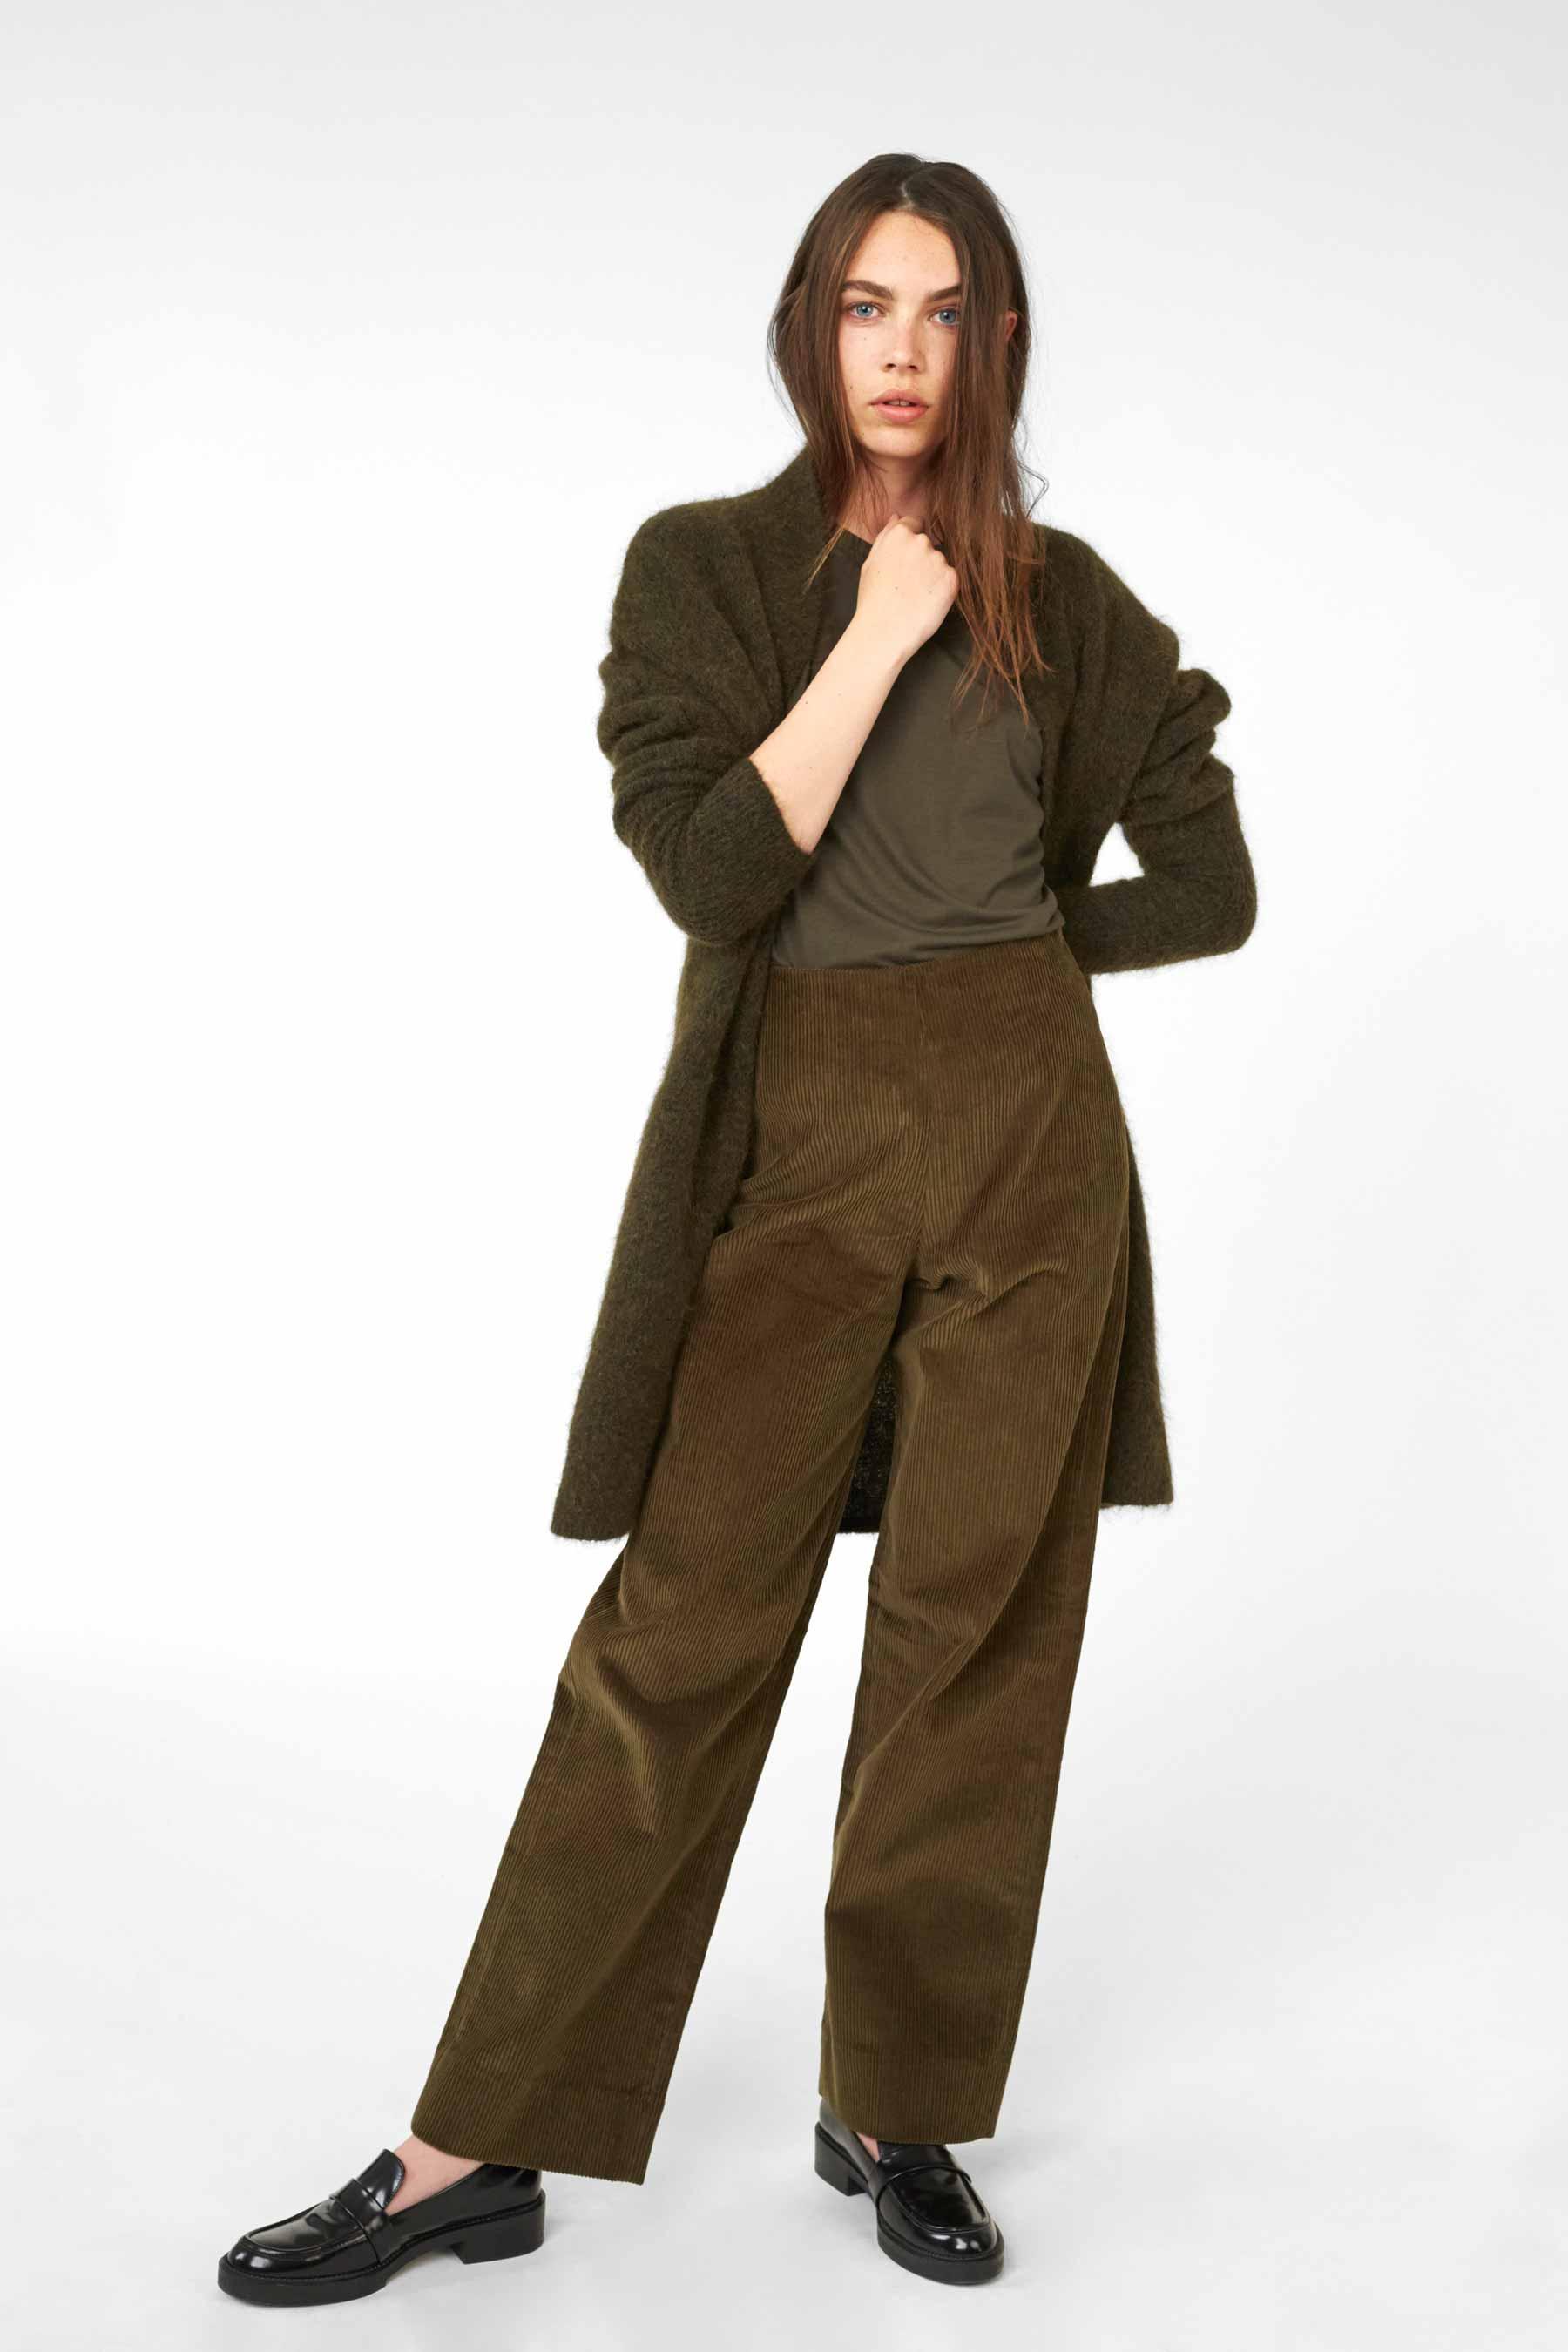 Cathrine Hammel - High Waist Corduroy Pants - 1061